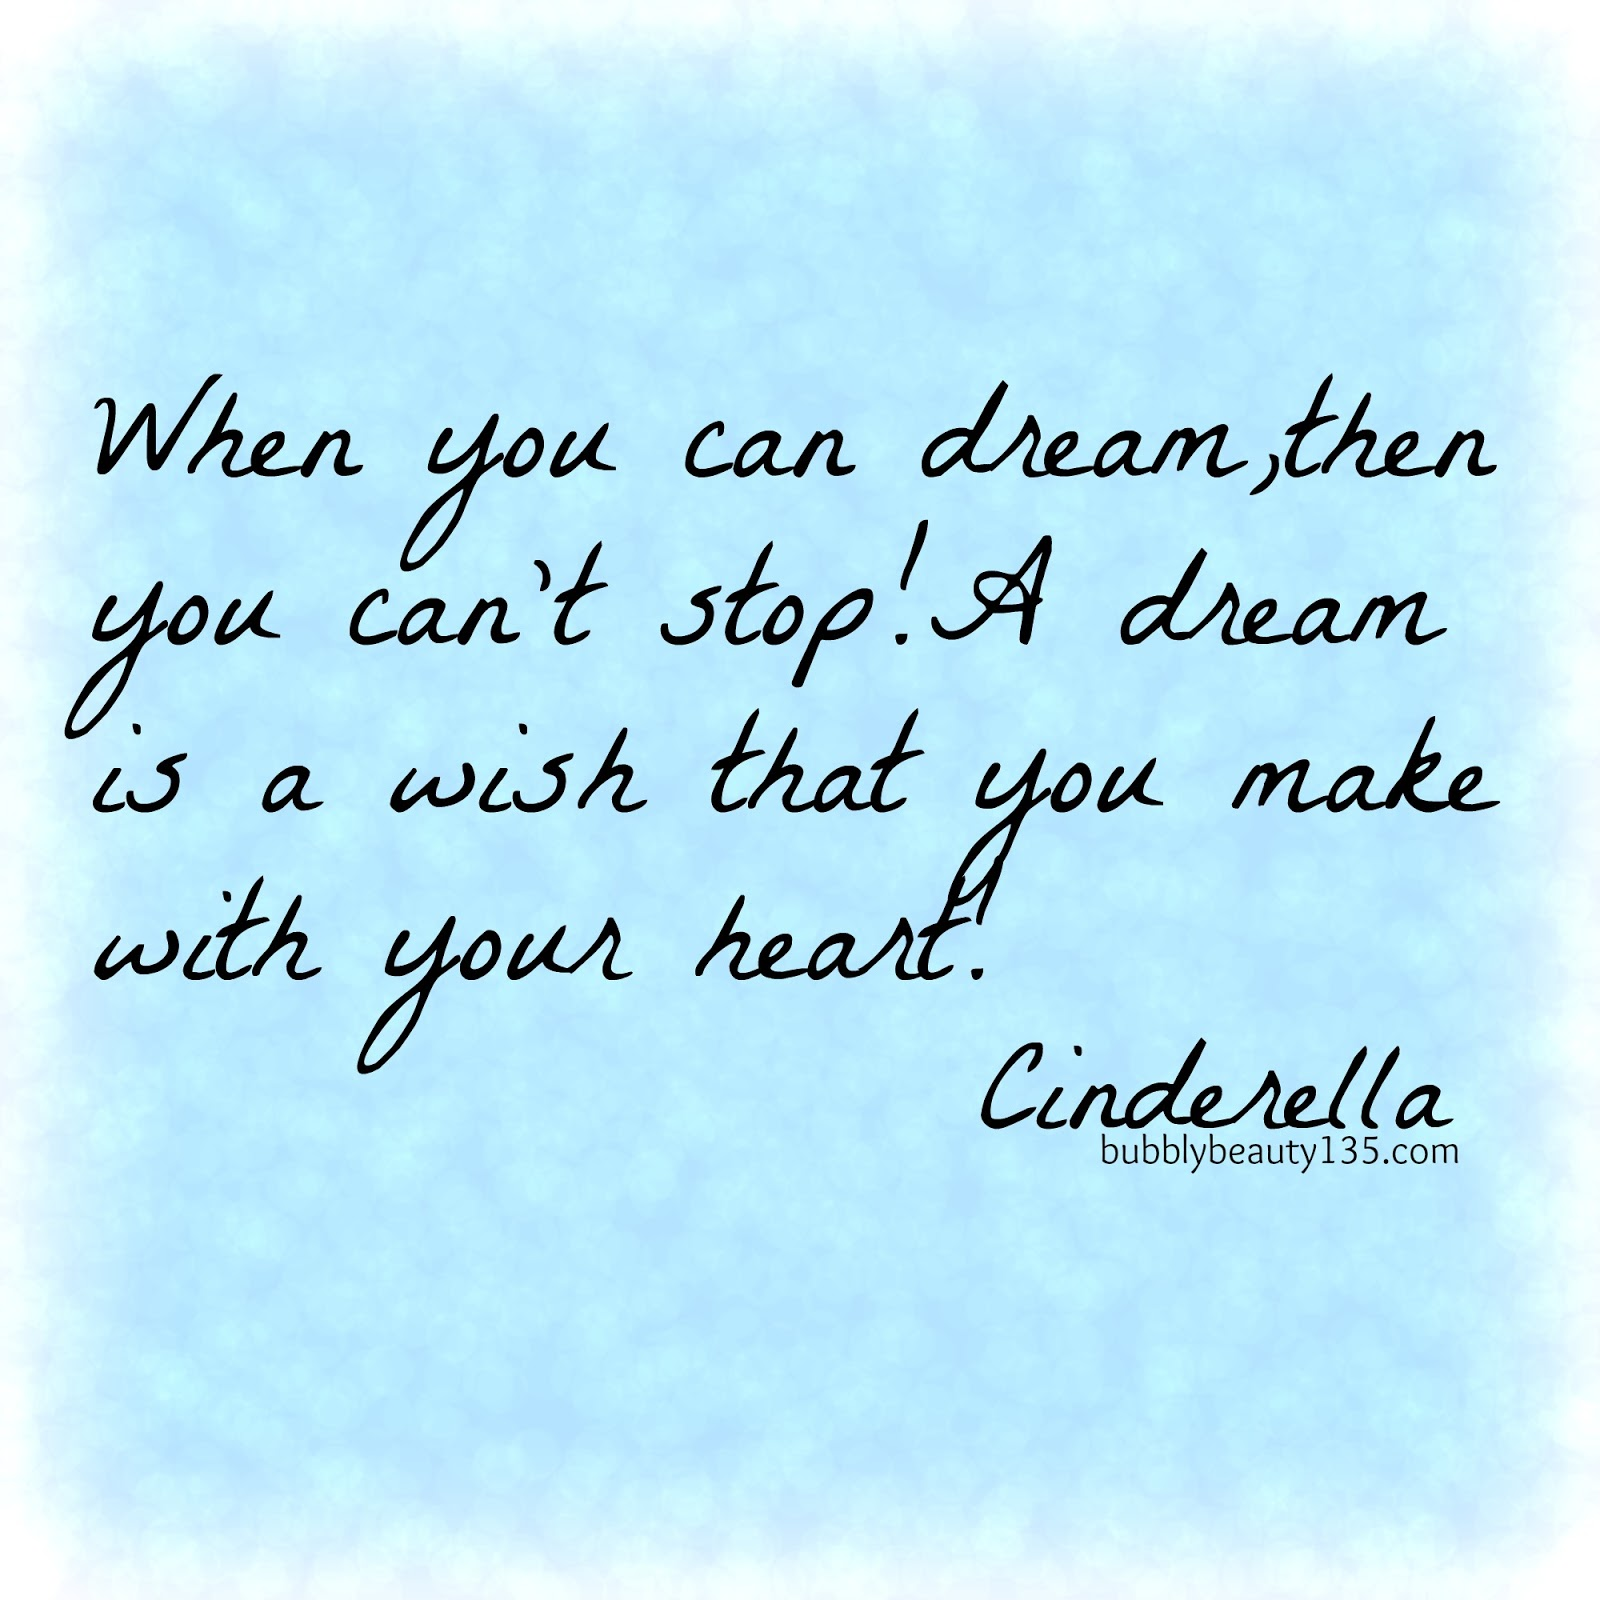 Motivational Monday #10 : Disney Princess Quotes | www.bubblybeauty135.com